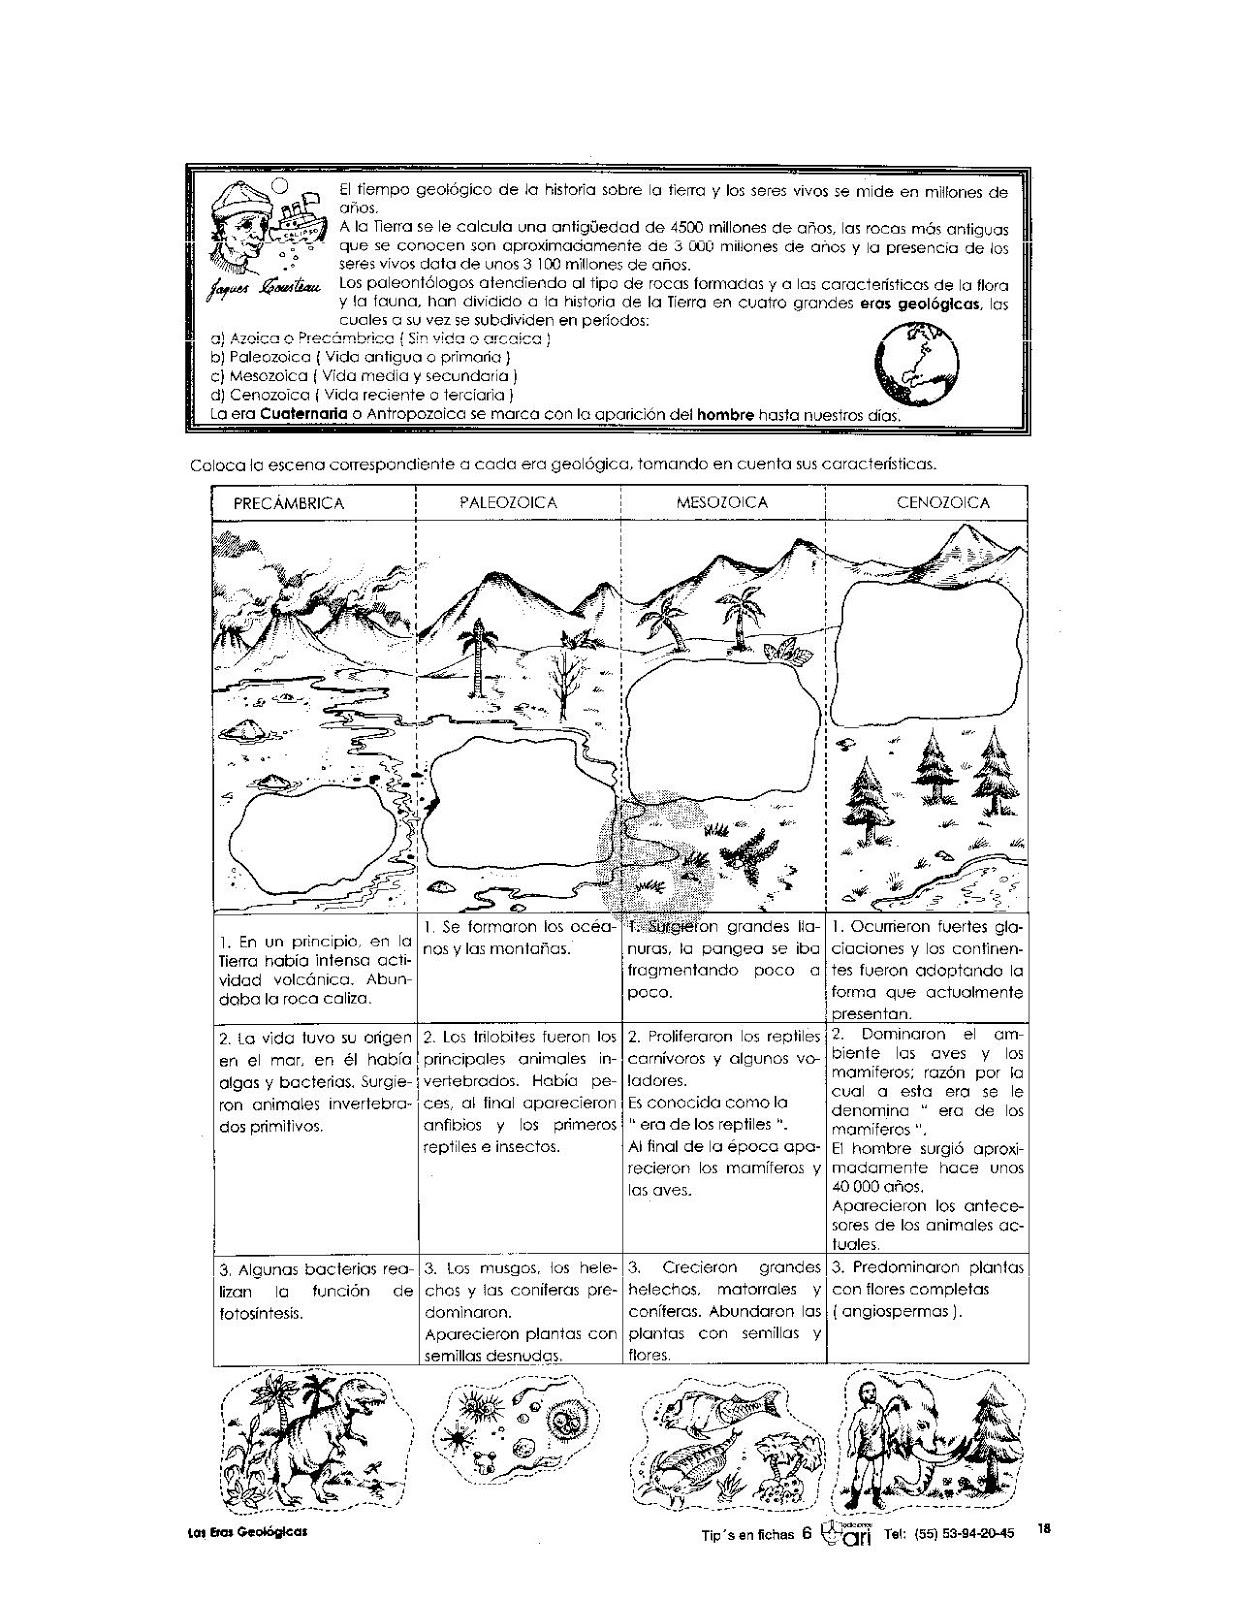 Eras geologicas para niños